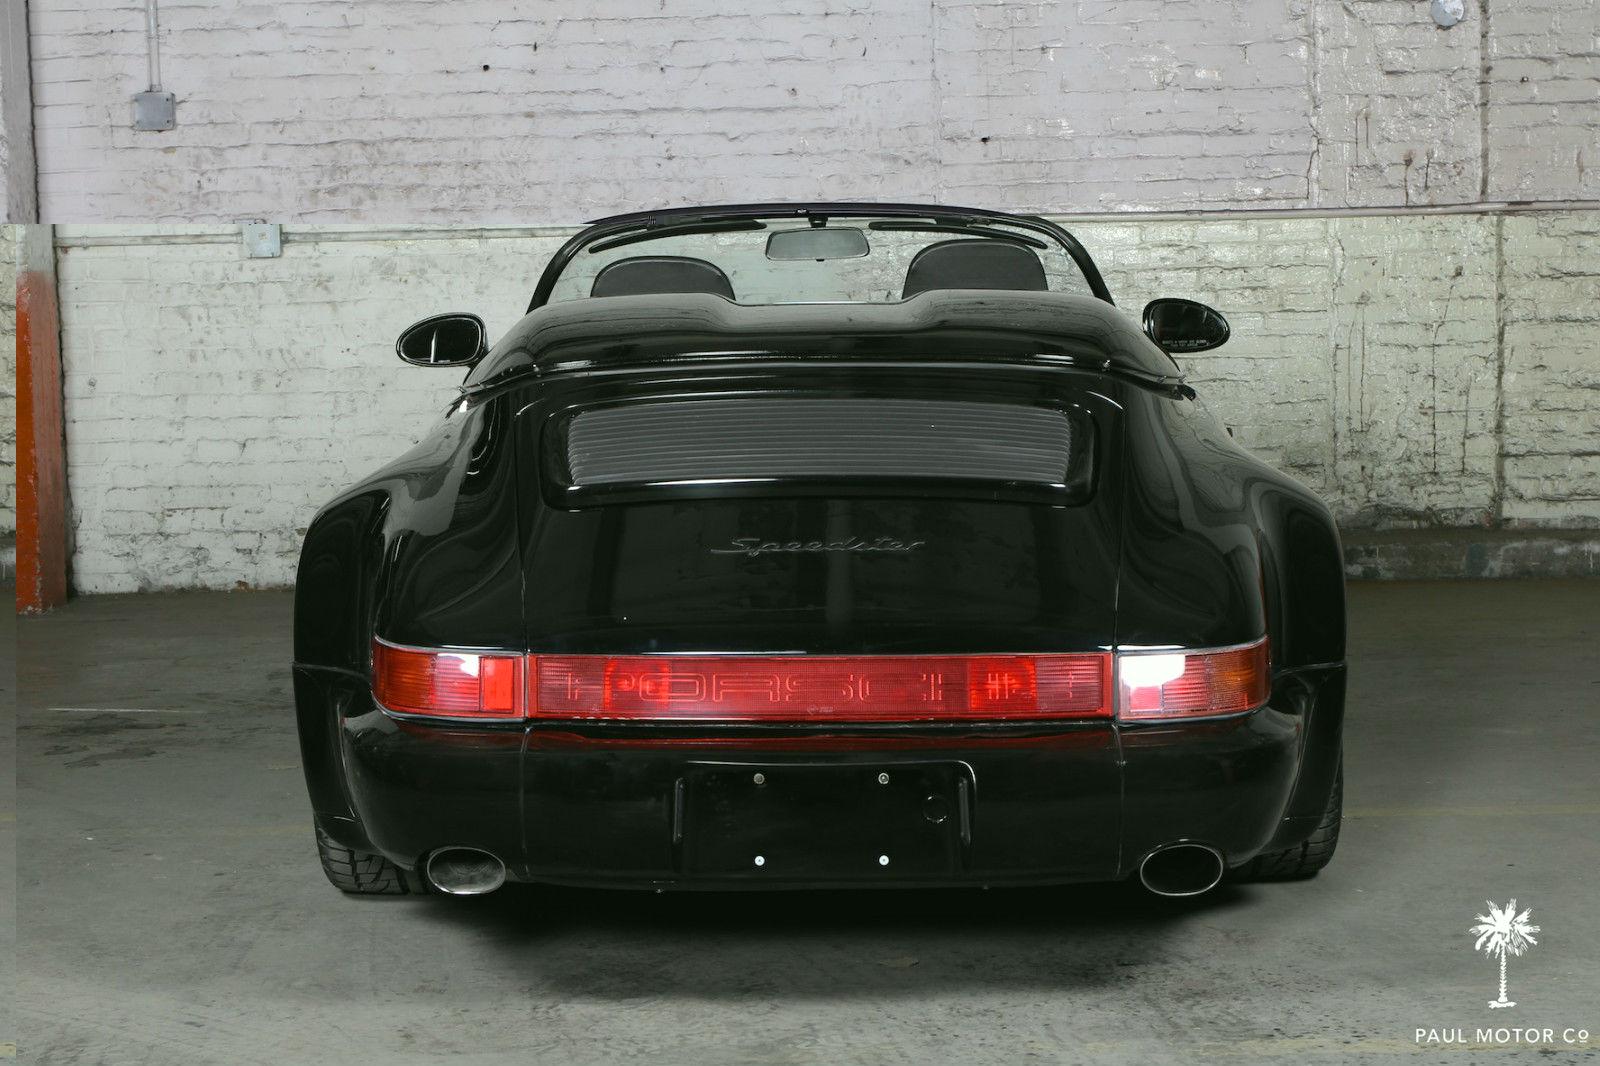 No Reserve 1990 Porsche 911 Carrera 2 Cabriolet 964